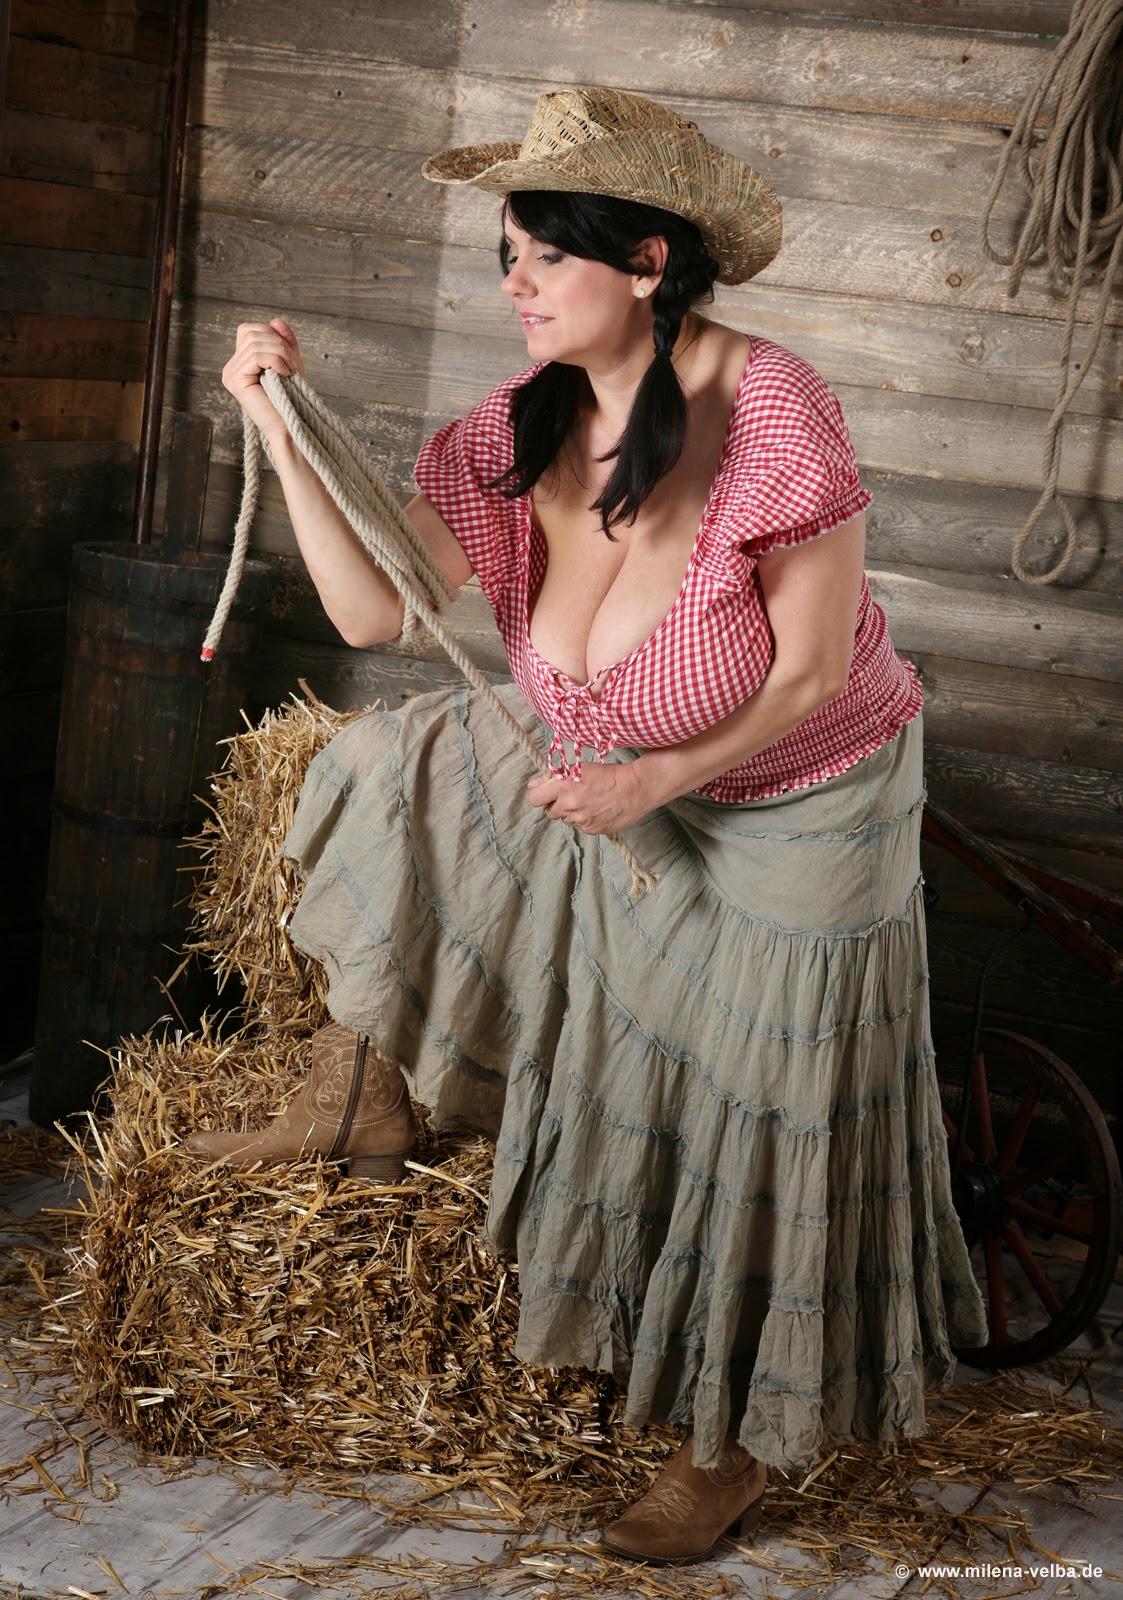 Голые тетки в деревне фото (перепутал